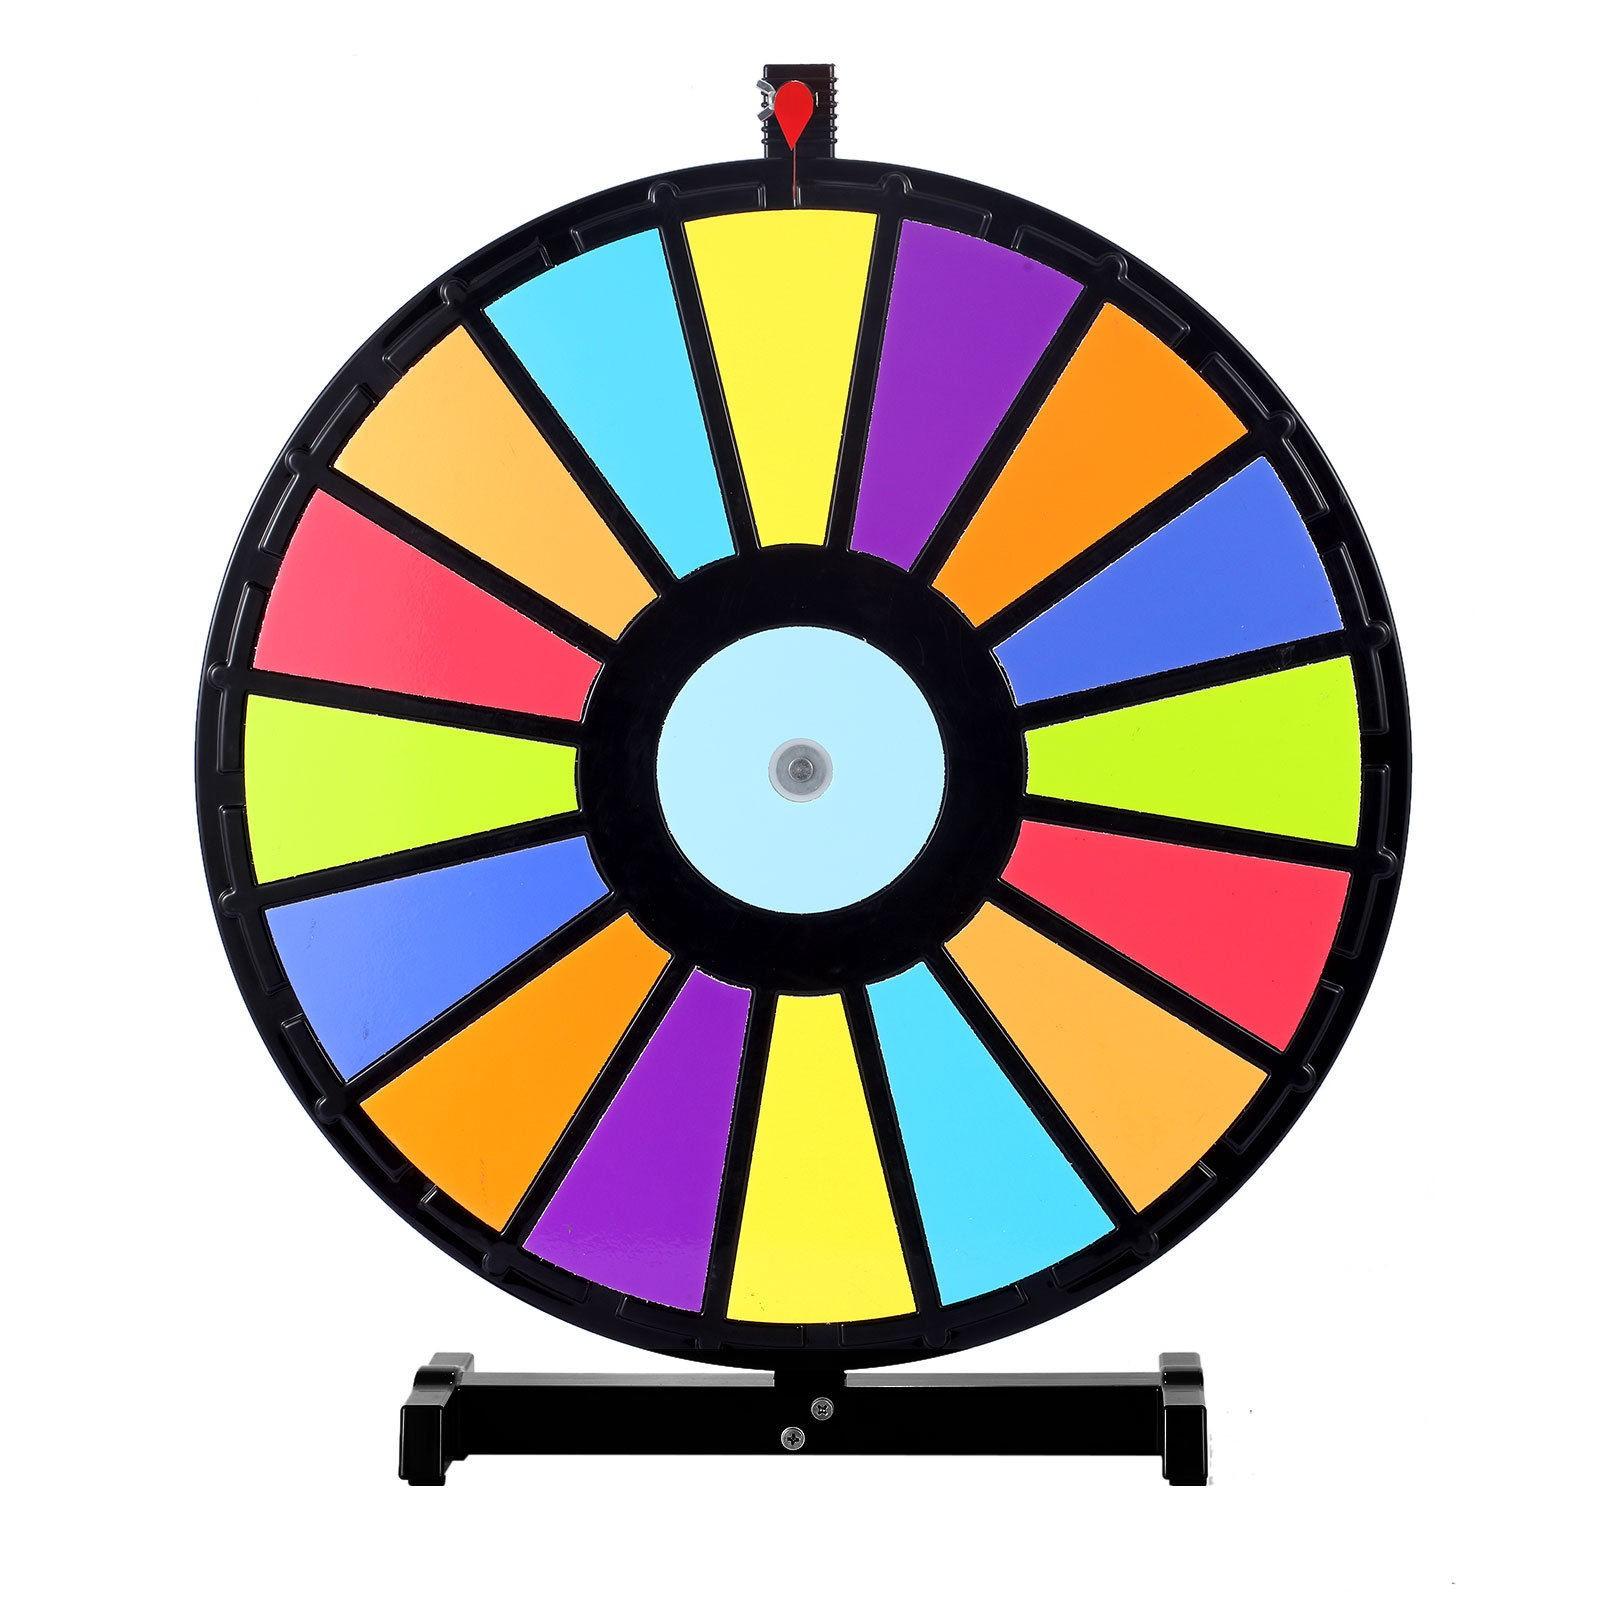 Game Show Wheel Clipart.